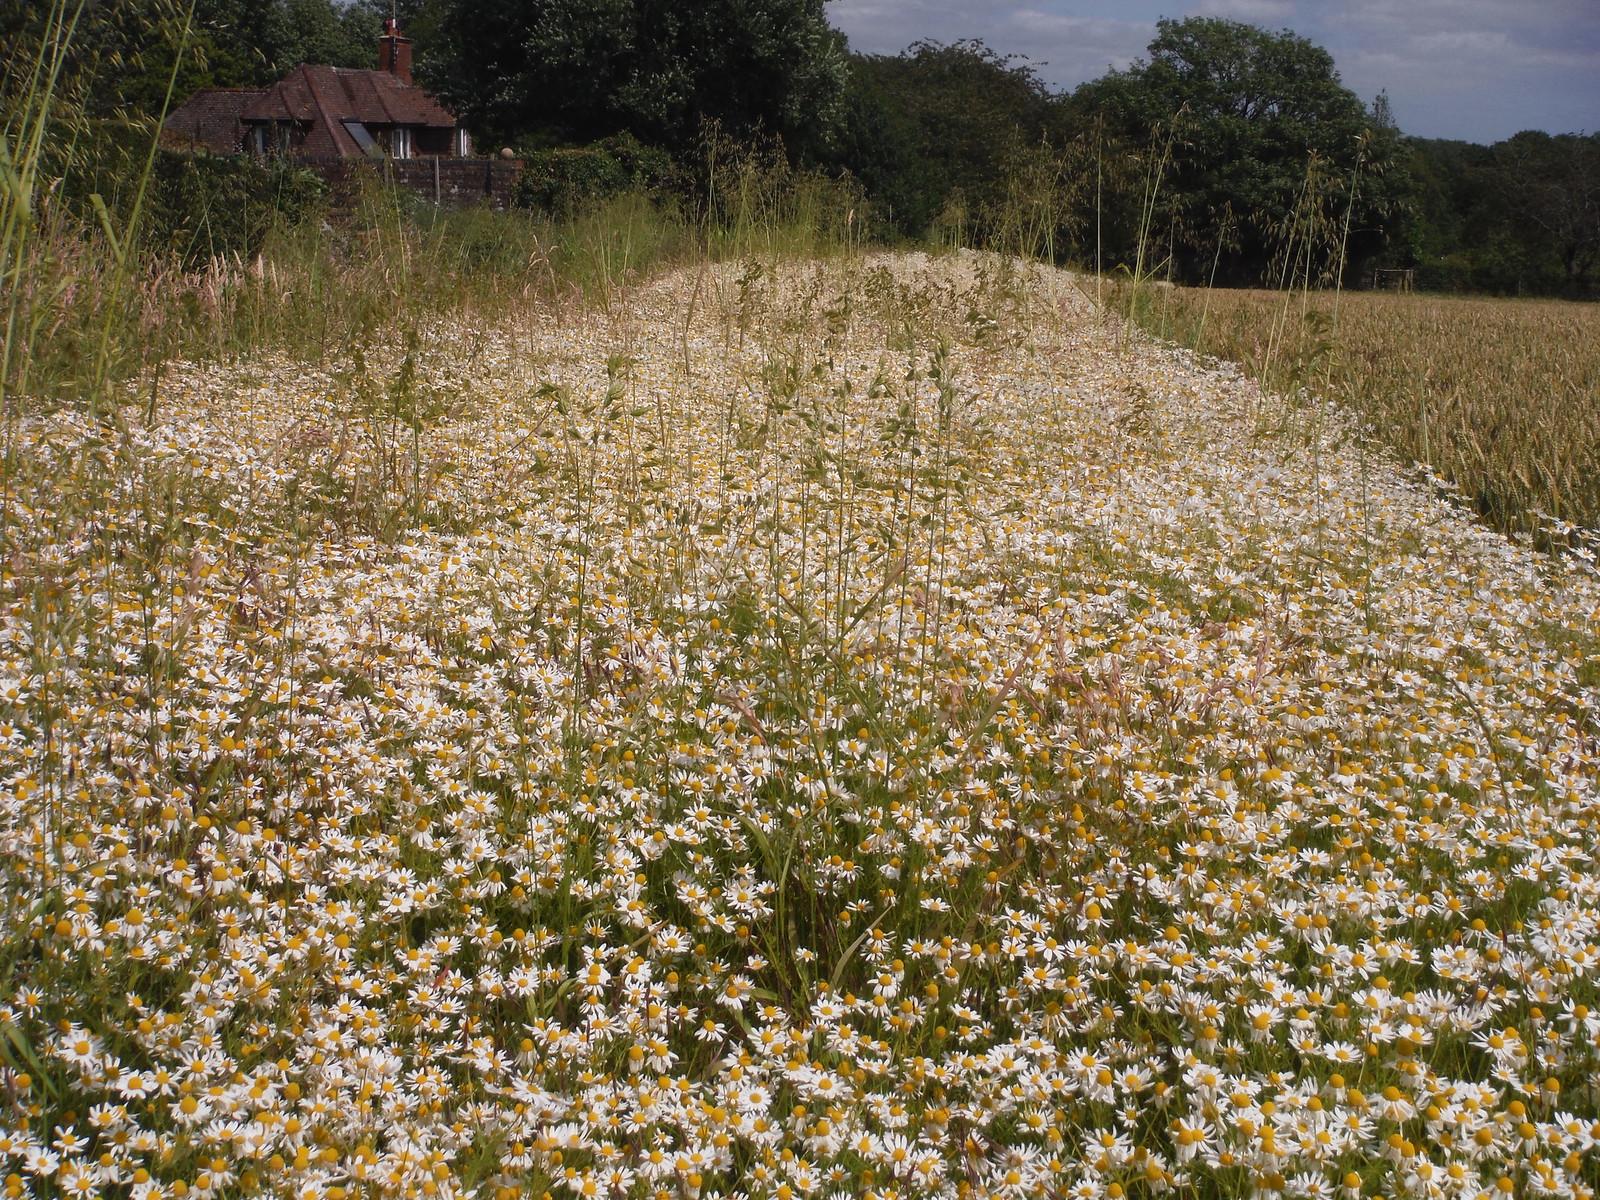 Flowers at field boundary SWC Walk 217 Midhurst Way: Arundel to Midhurst